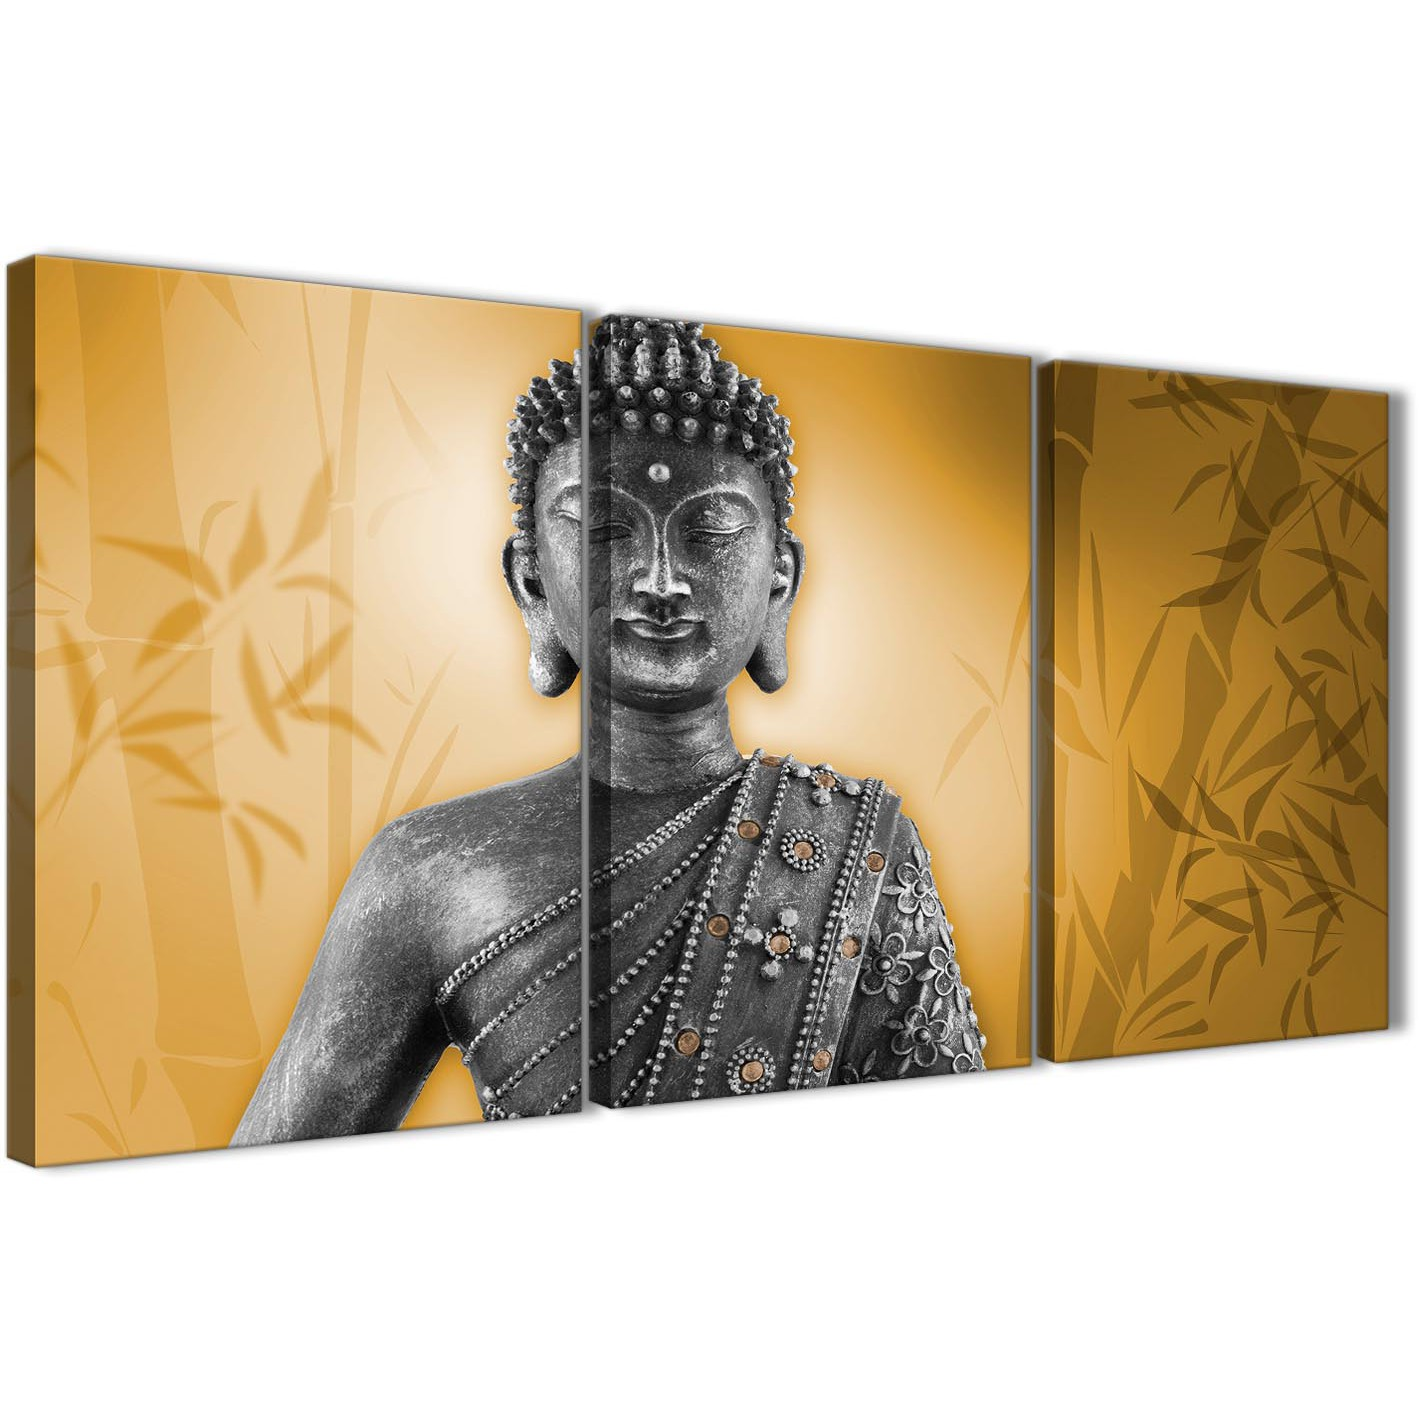 Grey Buddha Buddha Wall Art Pictures And Gray   iltribuno.com